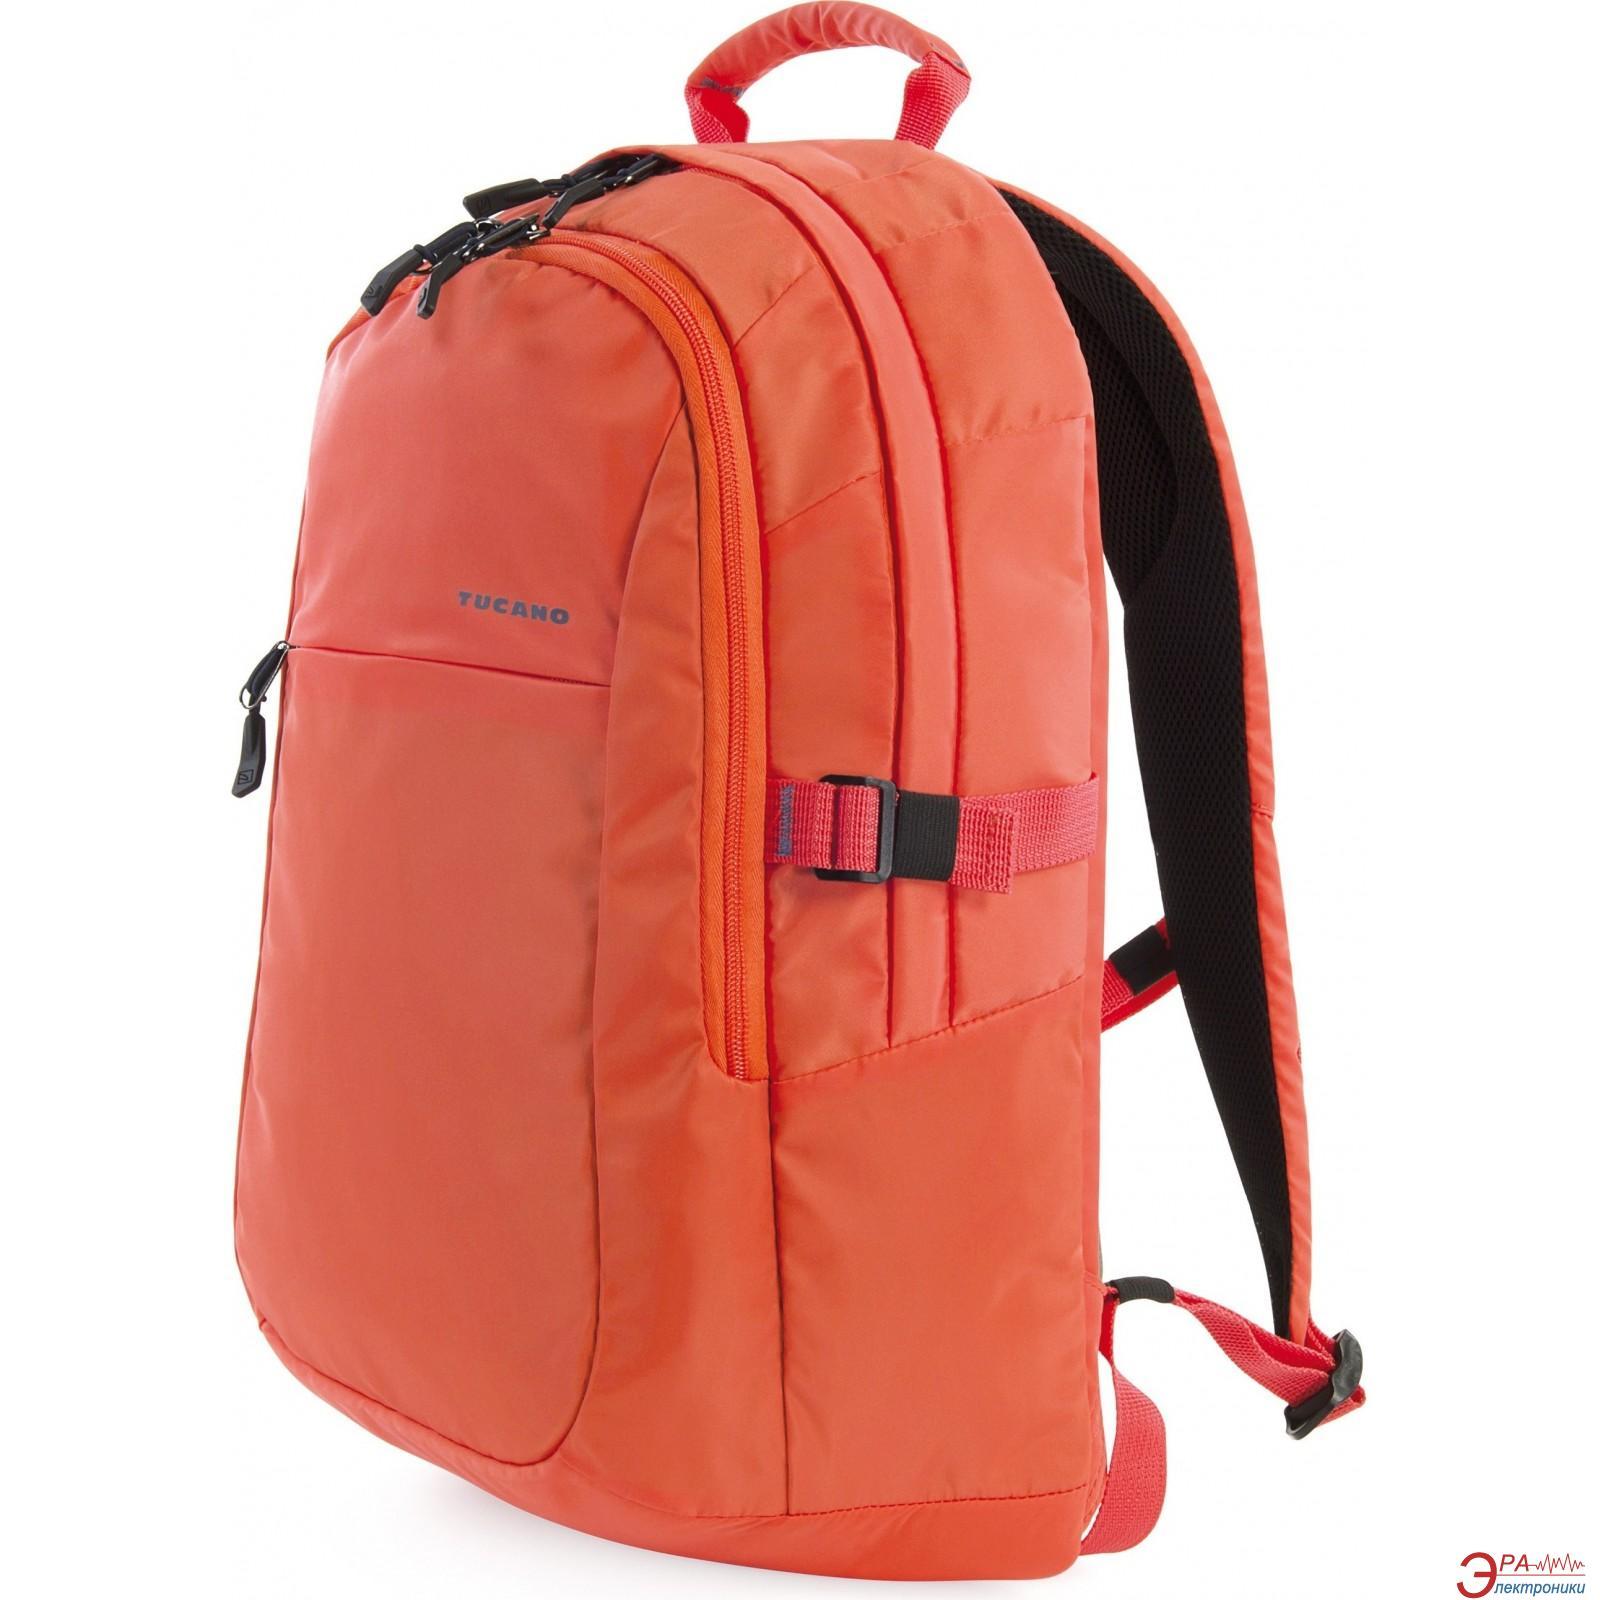 Рюкзак для ноутбука Tucano Livello Up 15.6' Orange (BKLIVU-O)